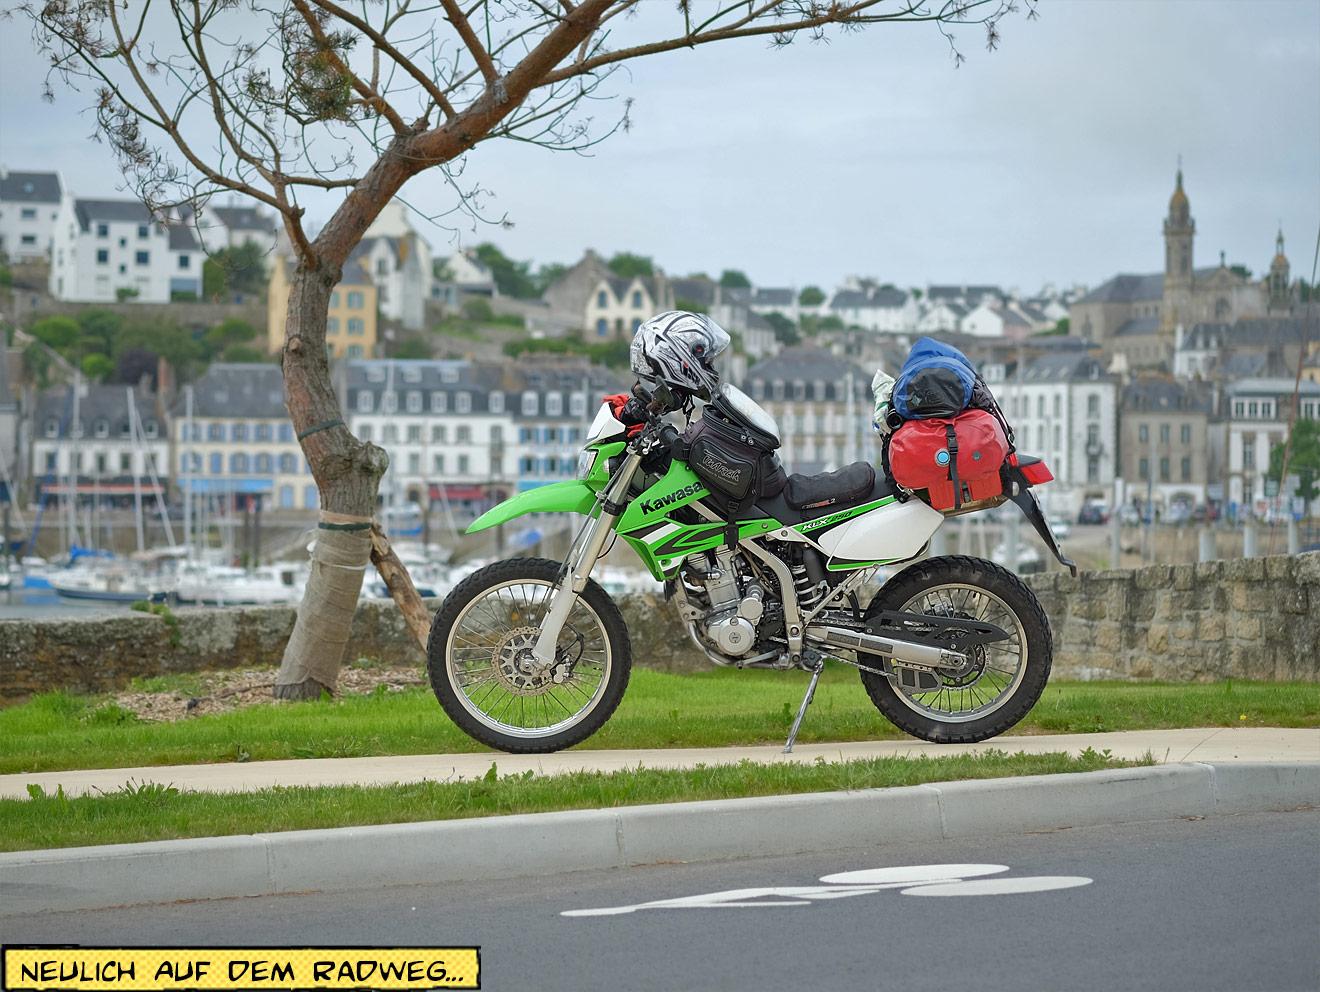 Motorrad steht auf dem Radweg